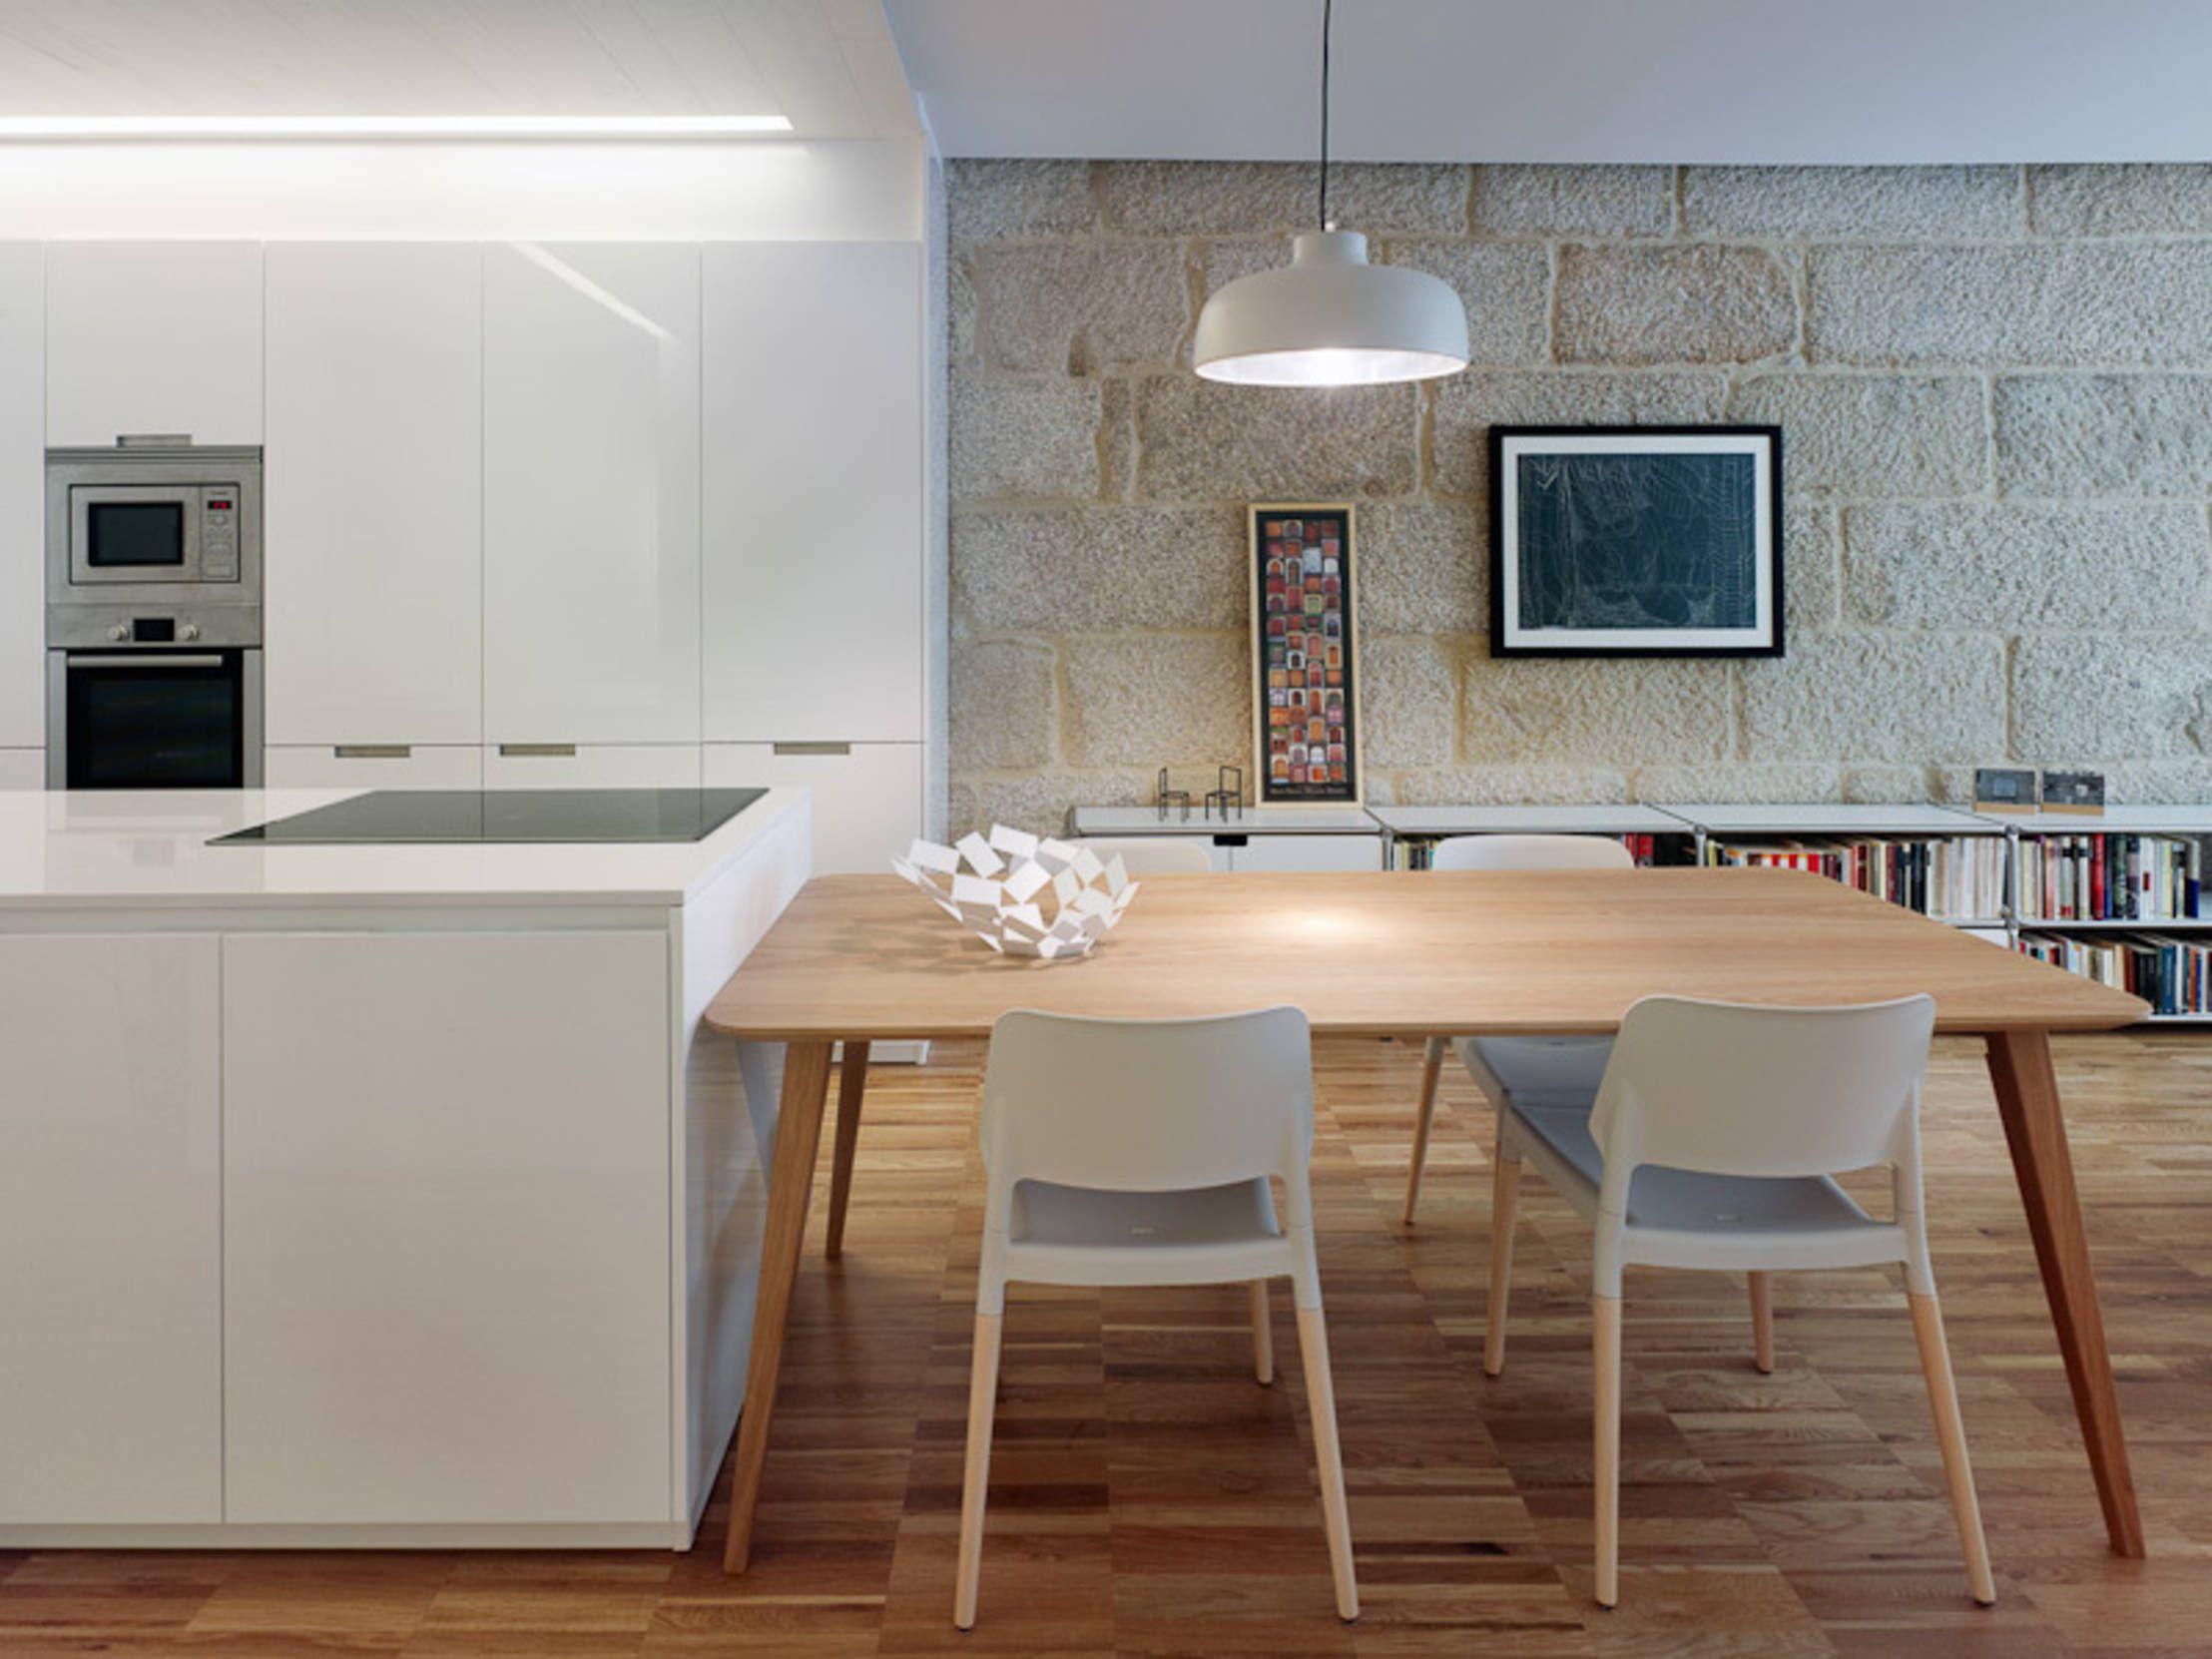 9 ideas para apartamentos pequeños ¡fabulosas! | Ideas para ...